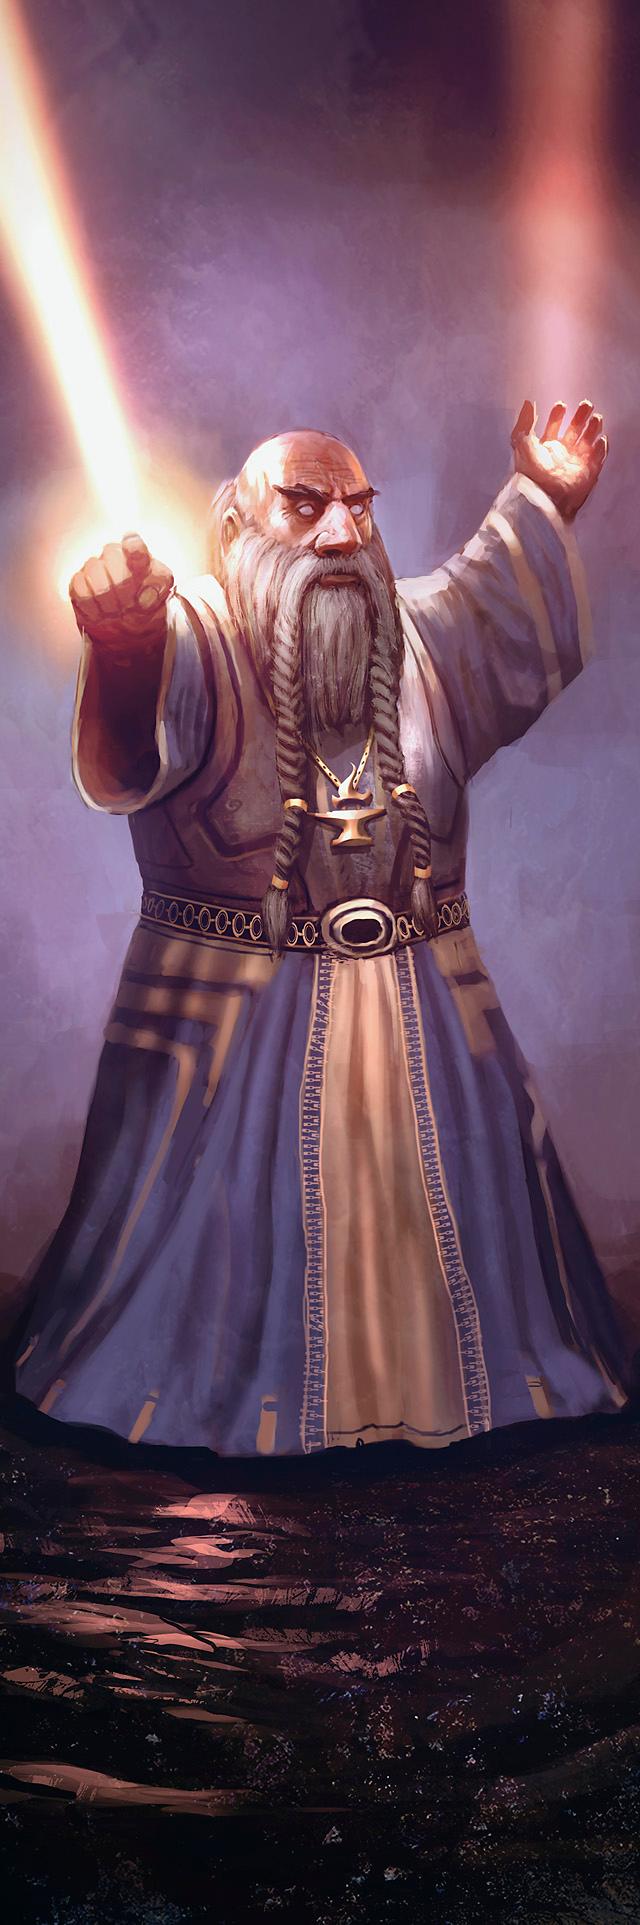 Cleric | Forgotten Realms Wiki | FANDOM powered by Wikia